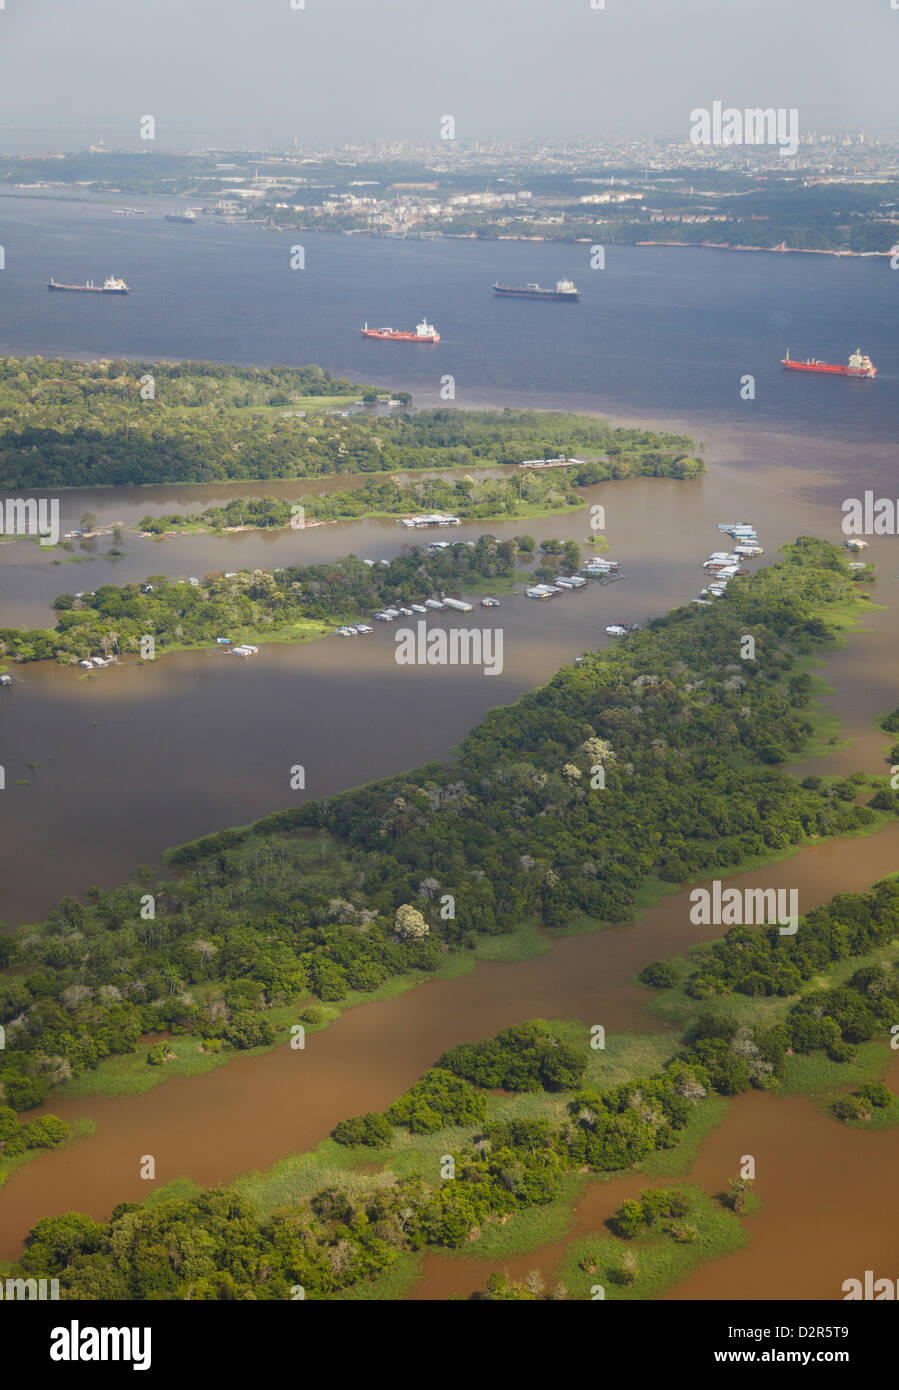 Aerial view of cargo ships on the Rio Negro, Manaus, Amazonas, Brazil, South America - Stock Image